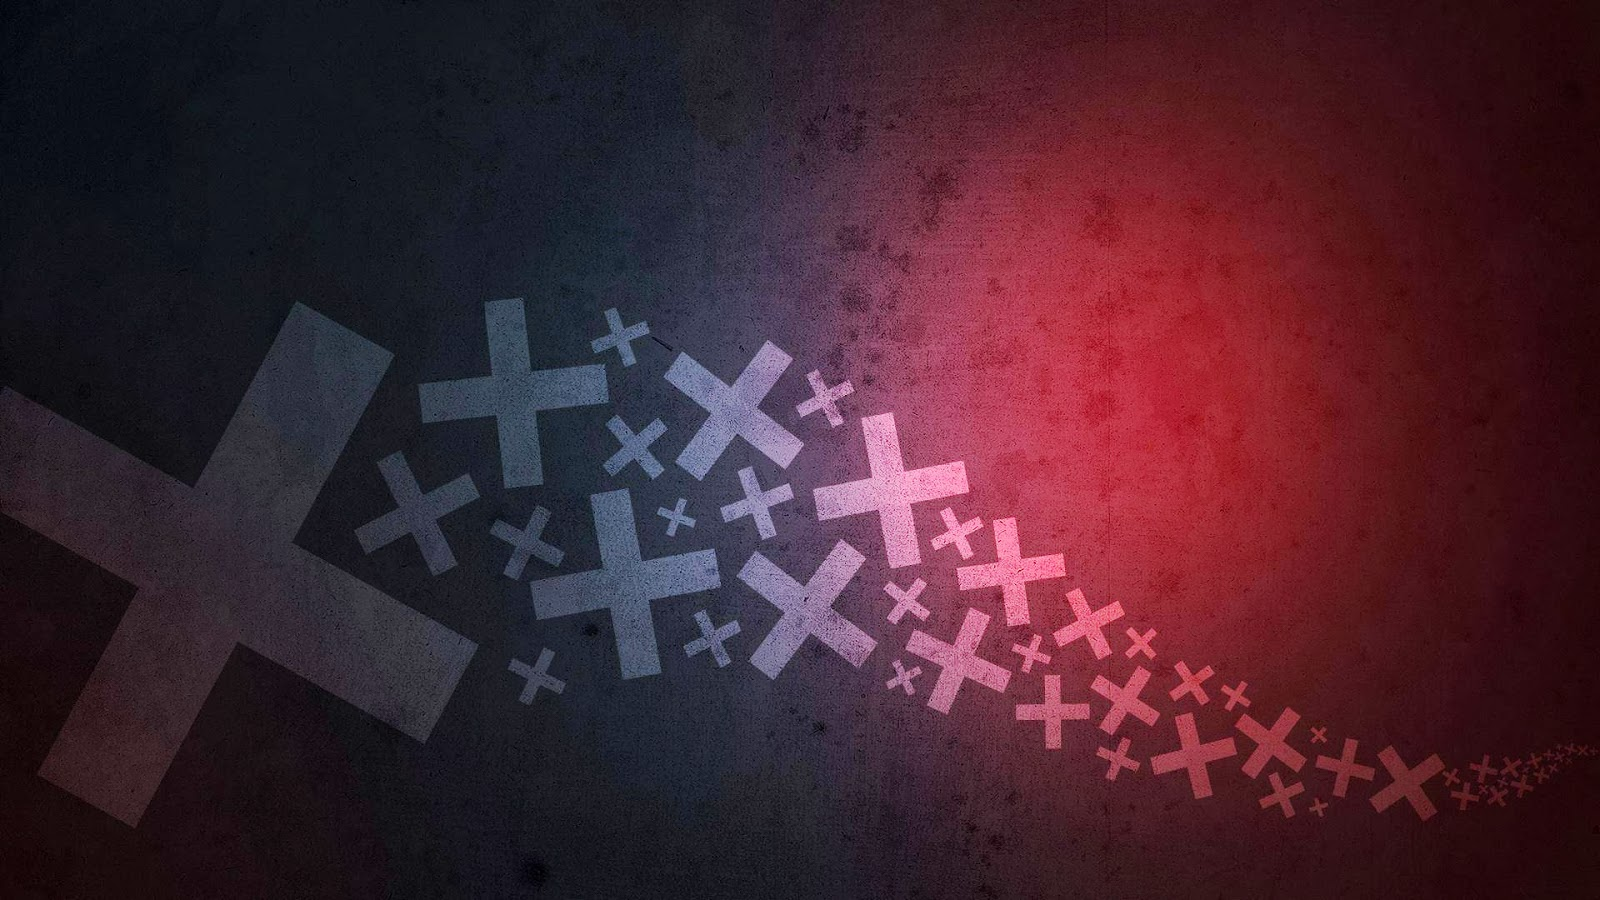 Fondo De Pantalla Abstracto Corriente De Cruces: Fondo De Pantalla Abstracto Corriente De Cruces